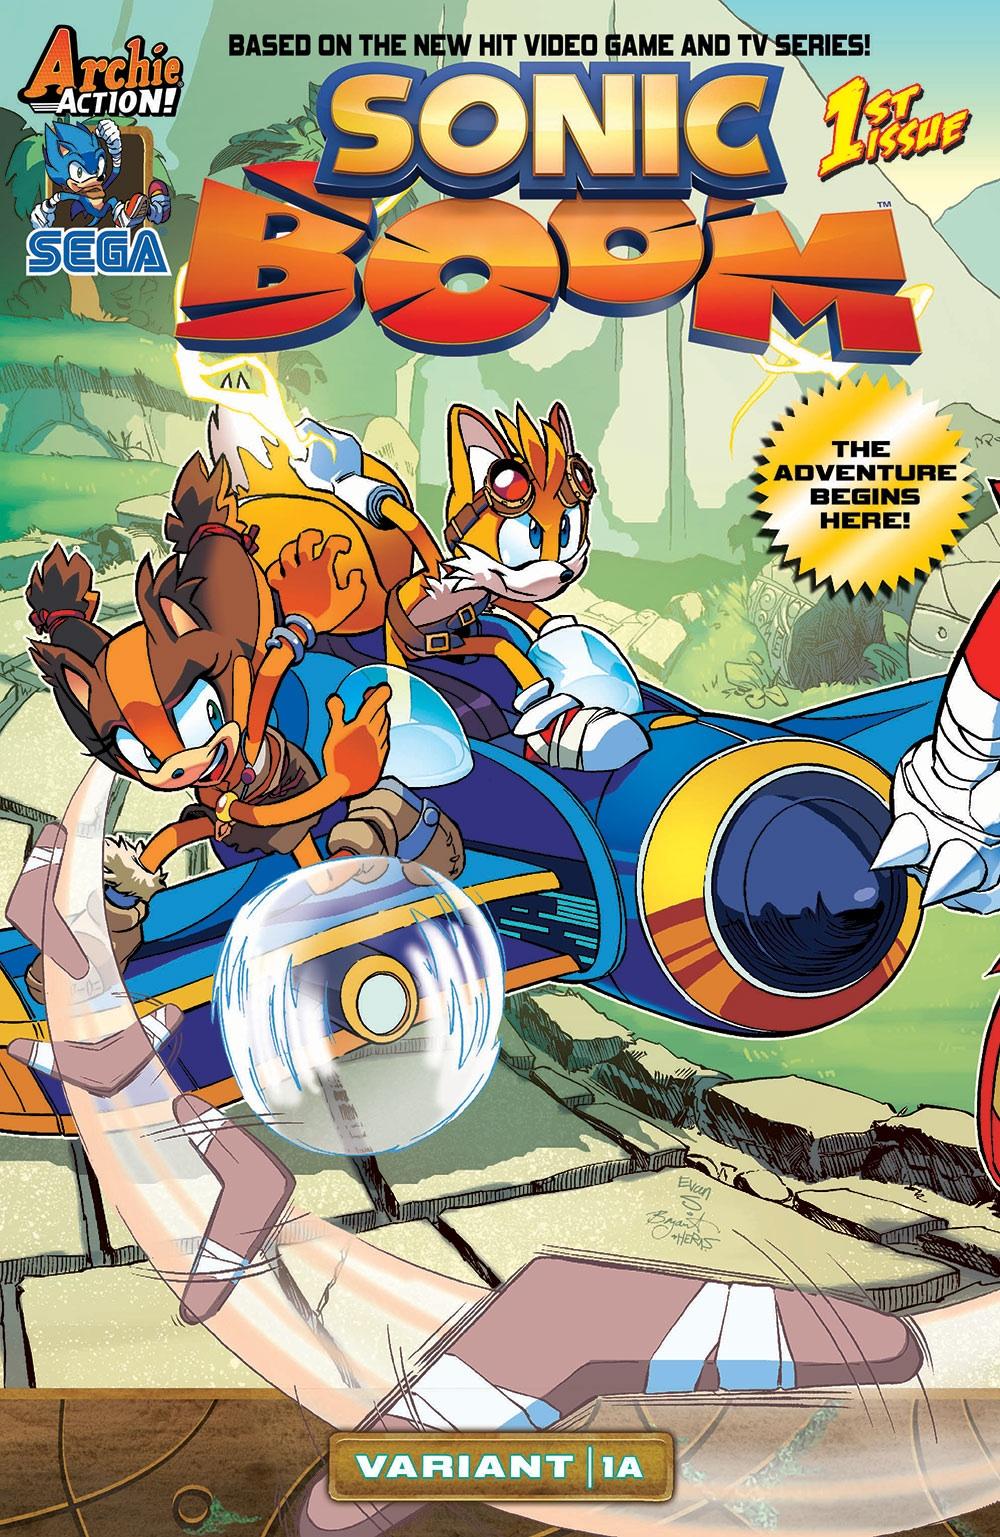 Archie Sonic Boom Issue 1 Mobius Encyclopaedia Fandom